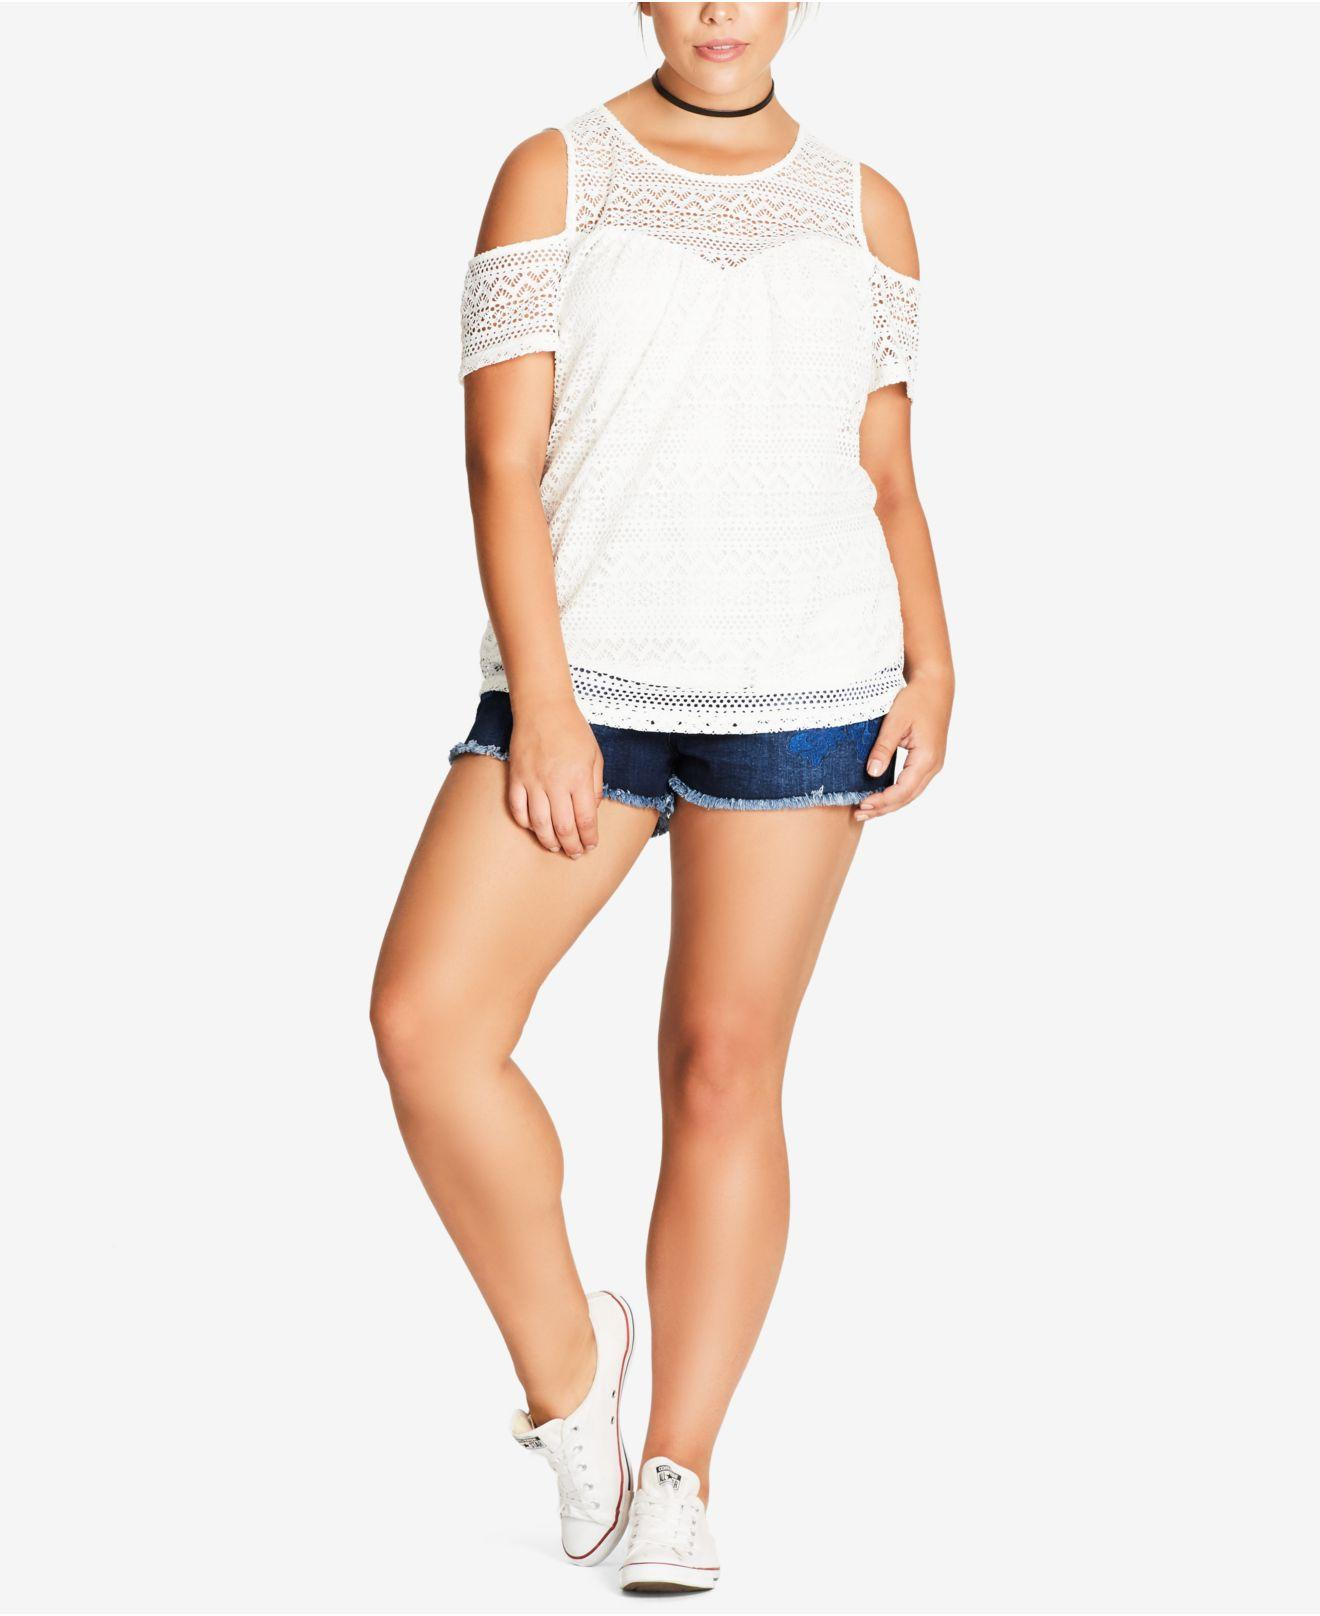 307ec6d0cb Lyst - City Chic Trendy Plus Size Cold-shoulder Illusion Top in White